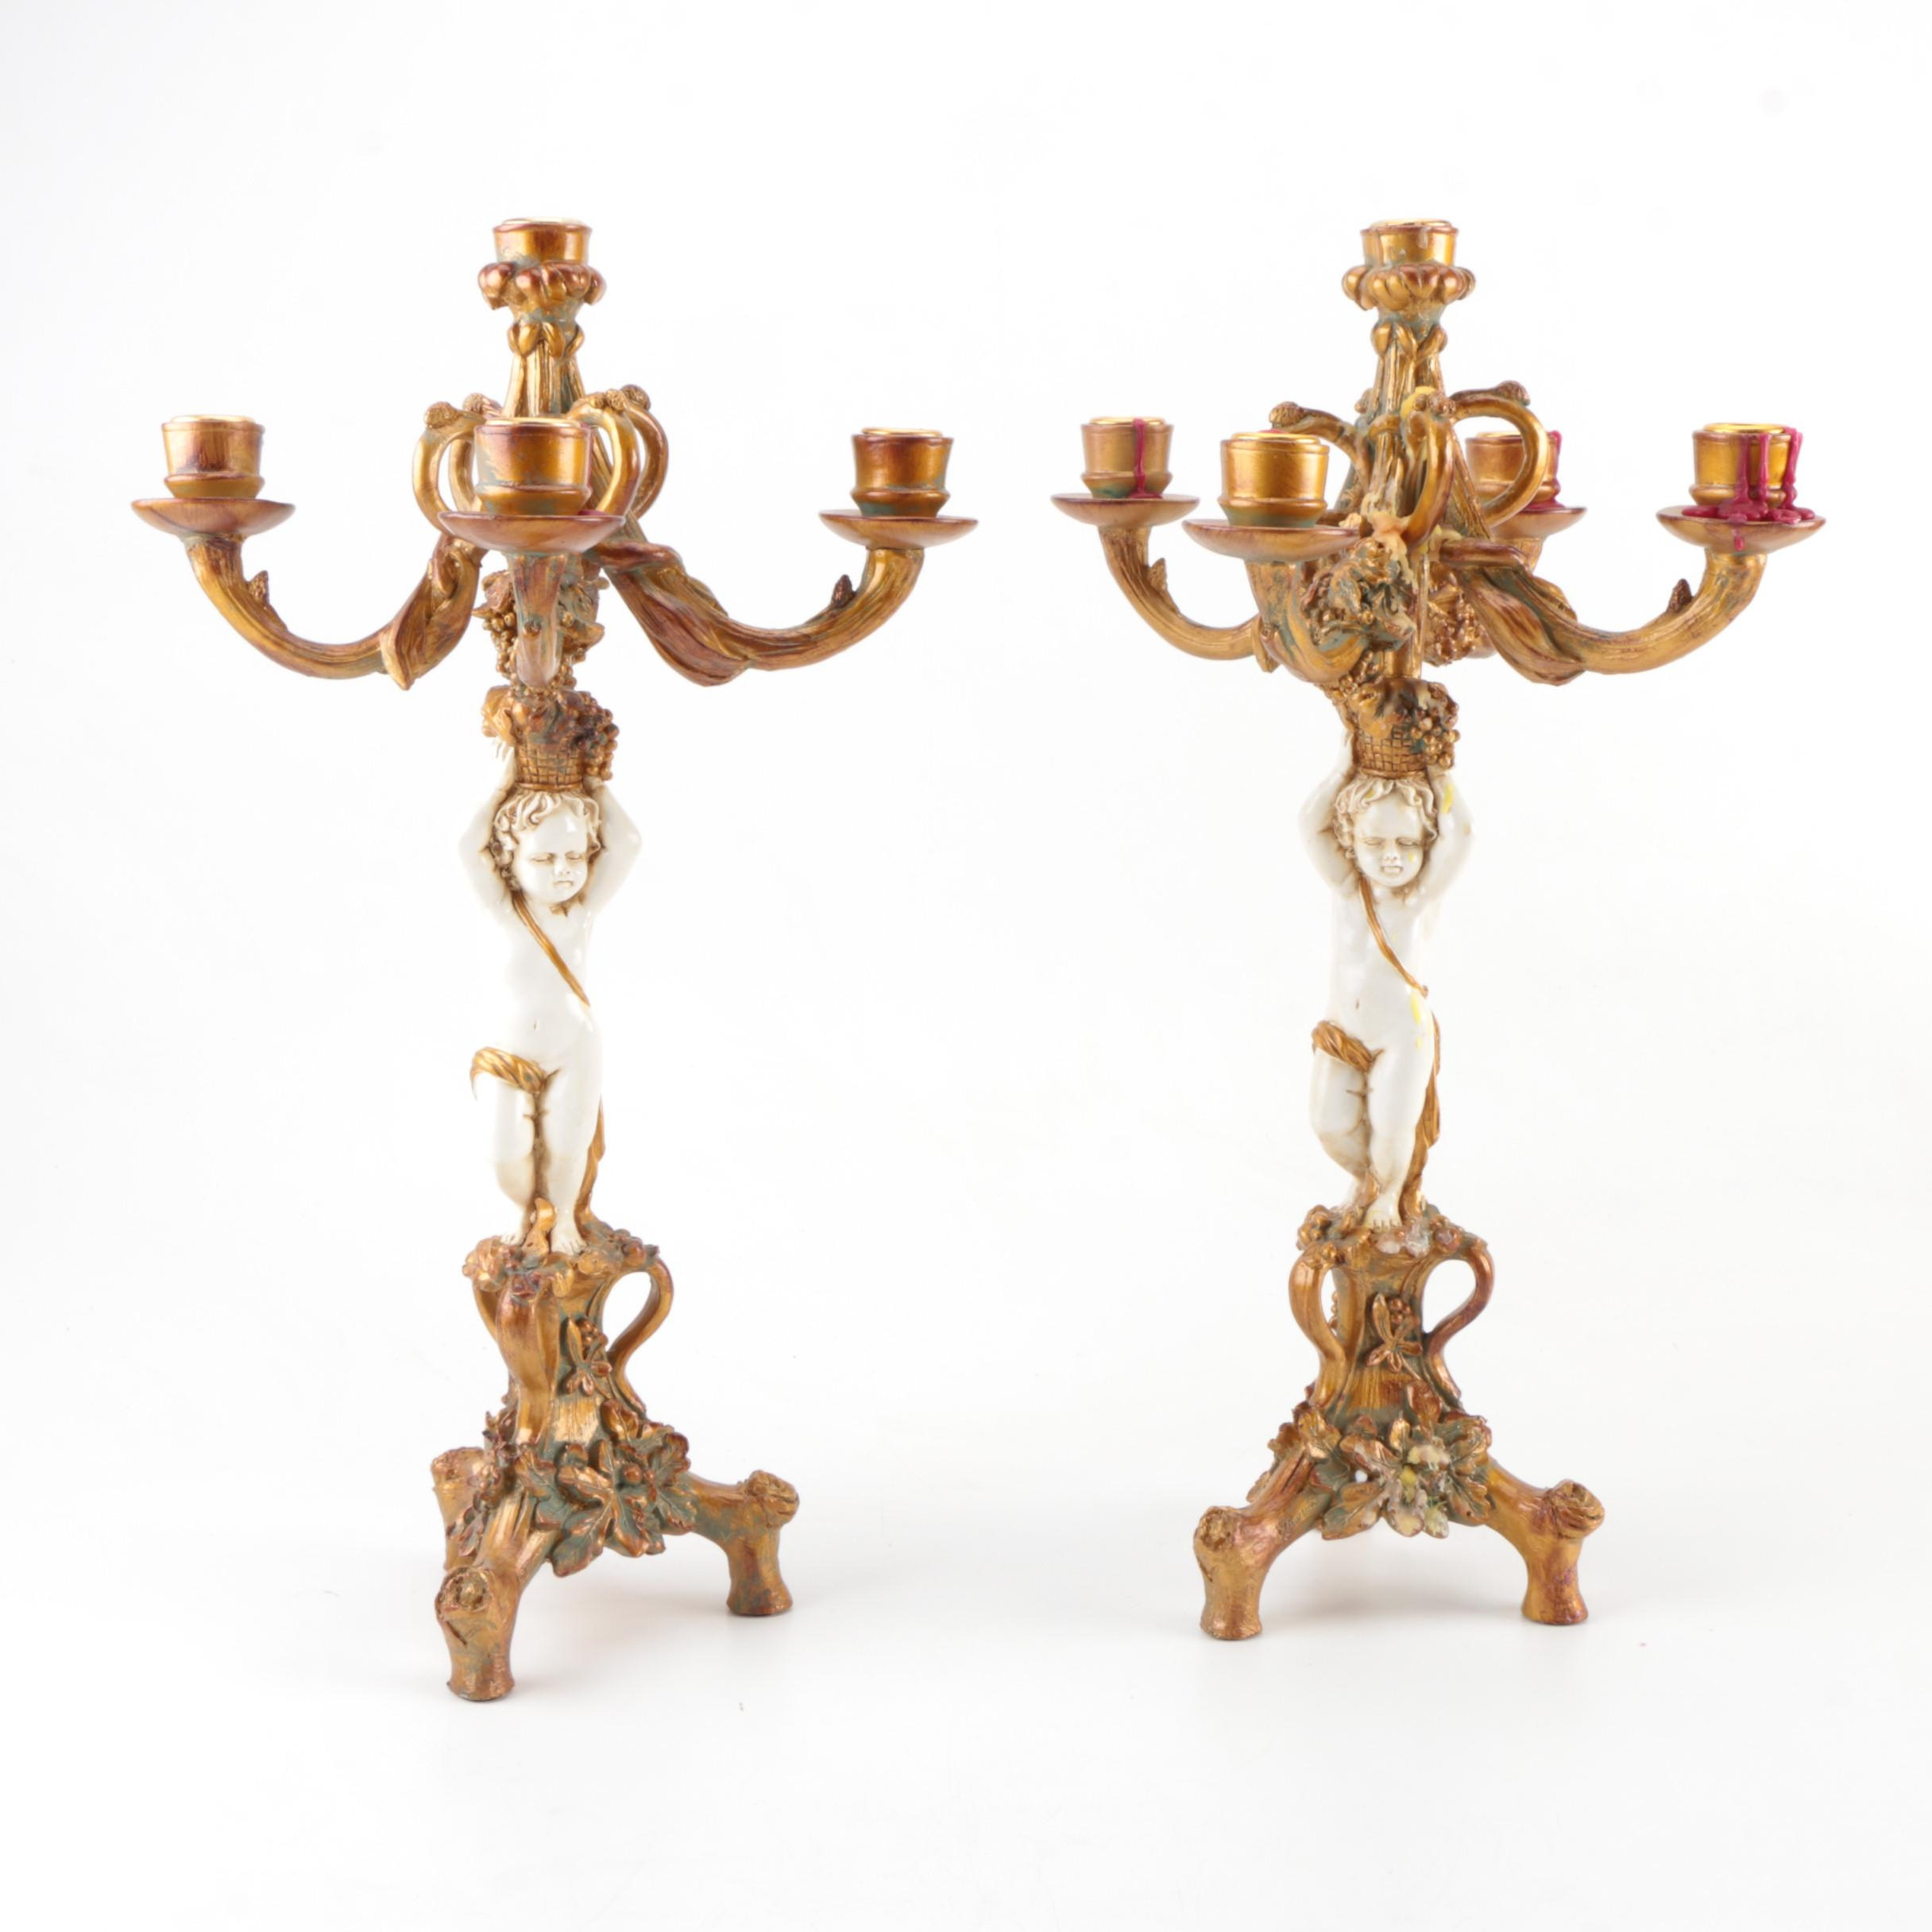 French Rococo Inspired Cherub Candelabras